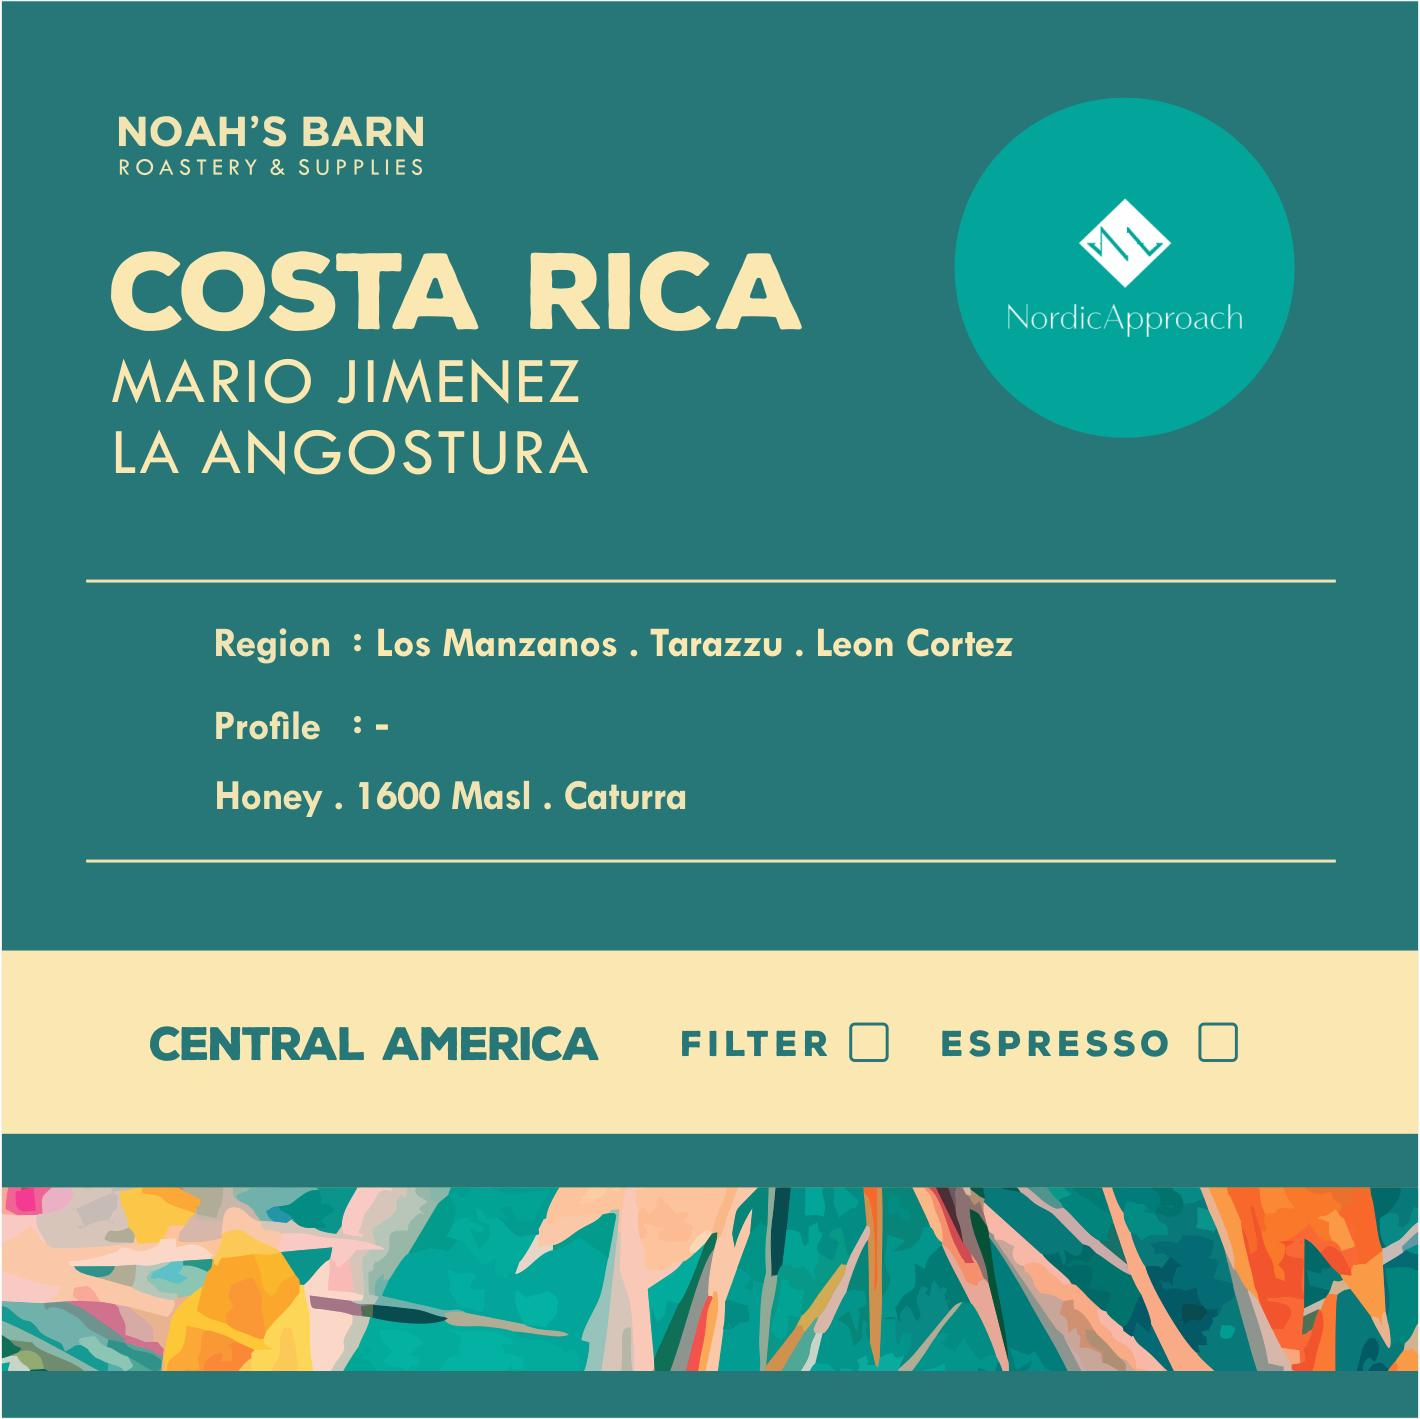 NOAH'S BARN COSTA RICA Mario Jimenez La Angostura Filter 500gr